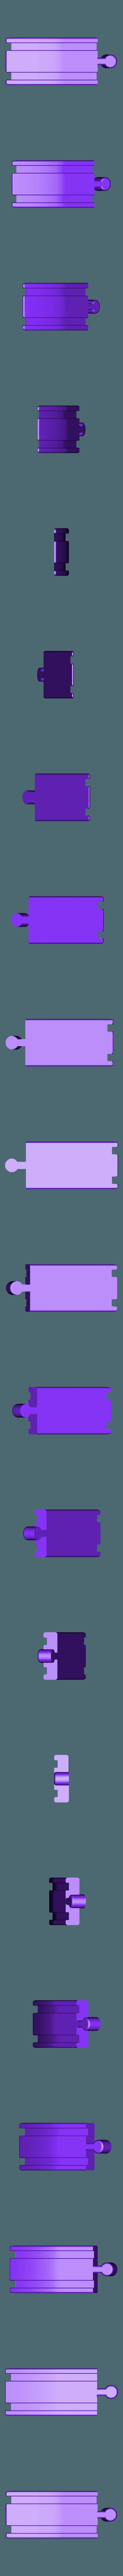 On-Ramp Track.stl Download free STL file Toy Train Tracks • 3D printer design, FerryTeacher